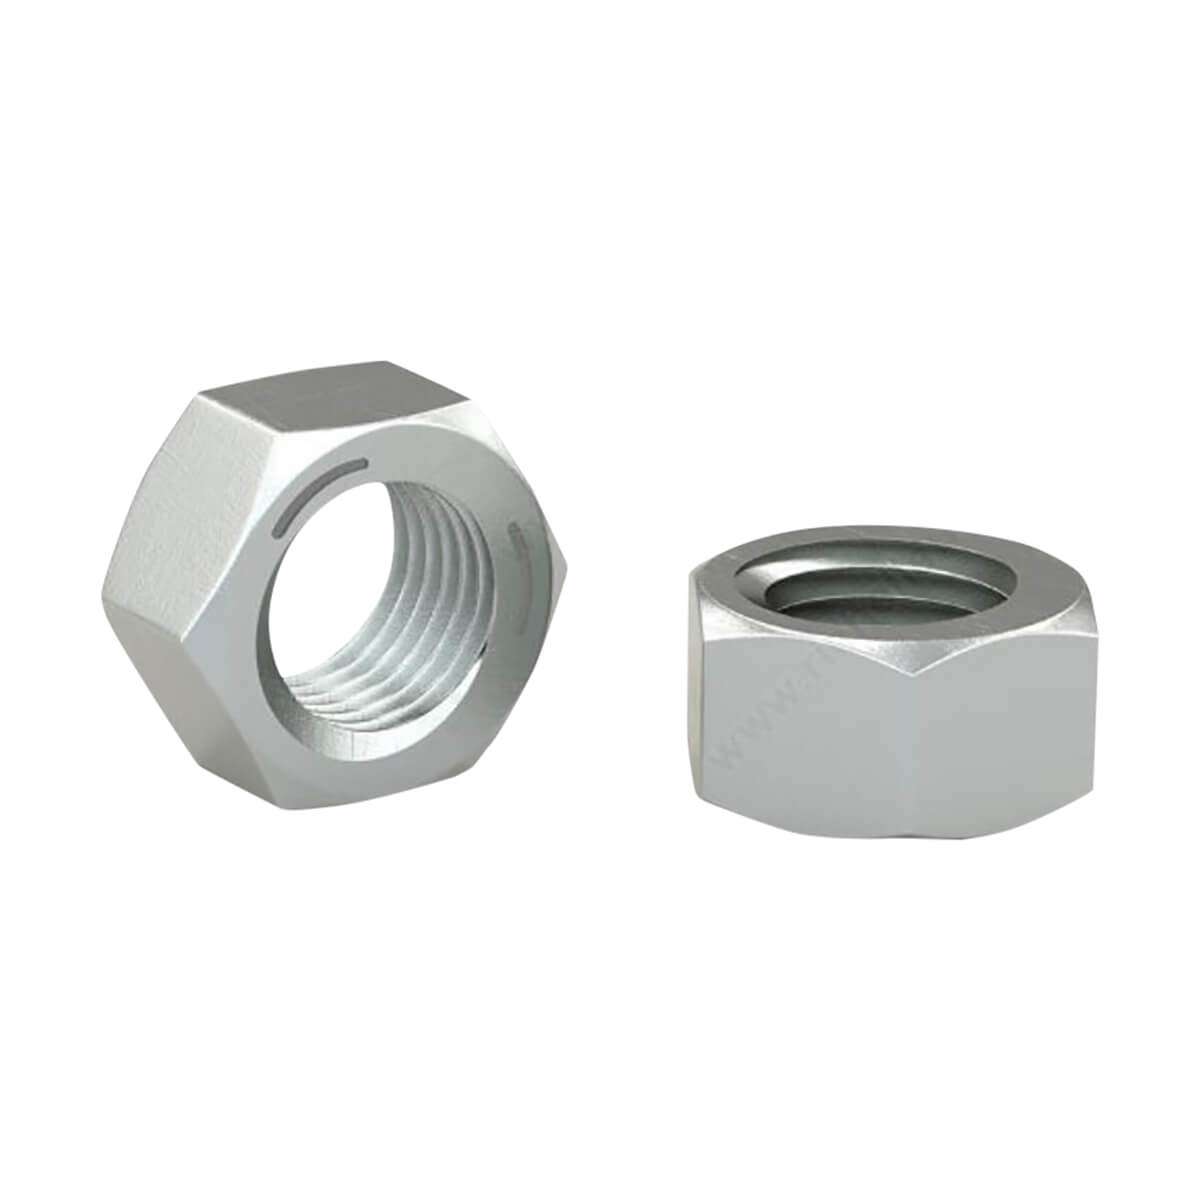 Hex Nut - 3/8-in - 2500 Pieces